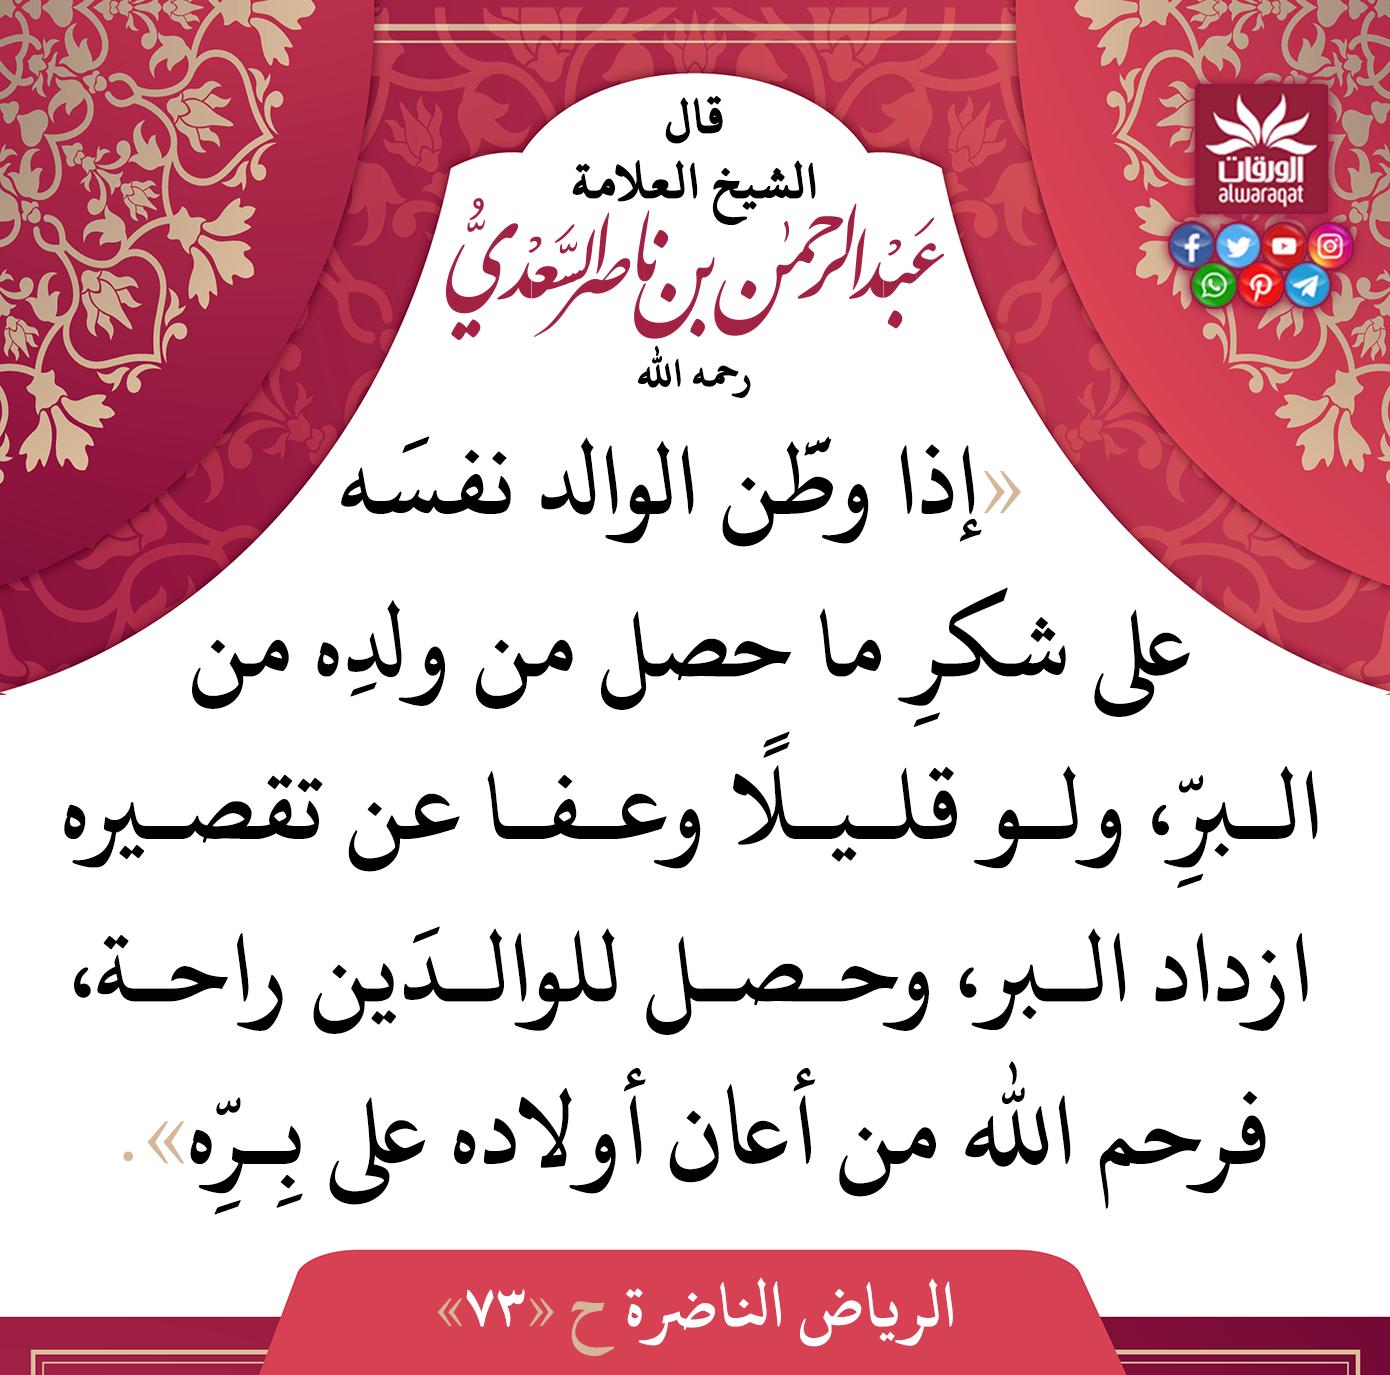 Siedi1 Arabic Calligraphy Calligraphy